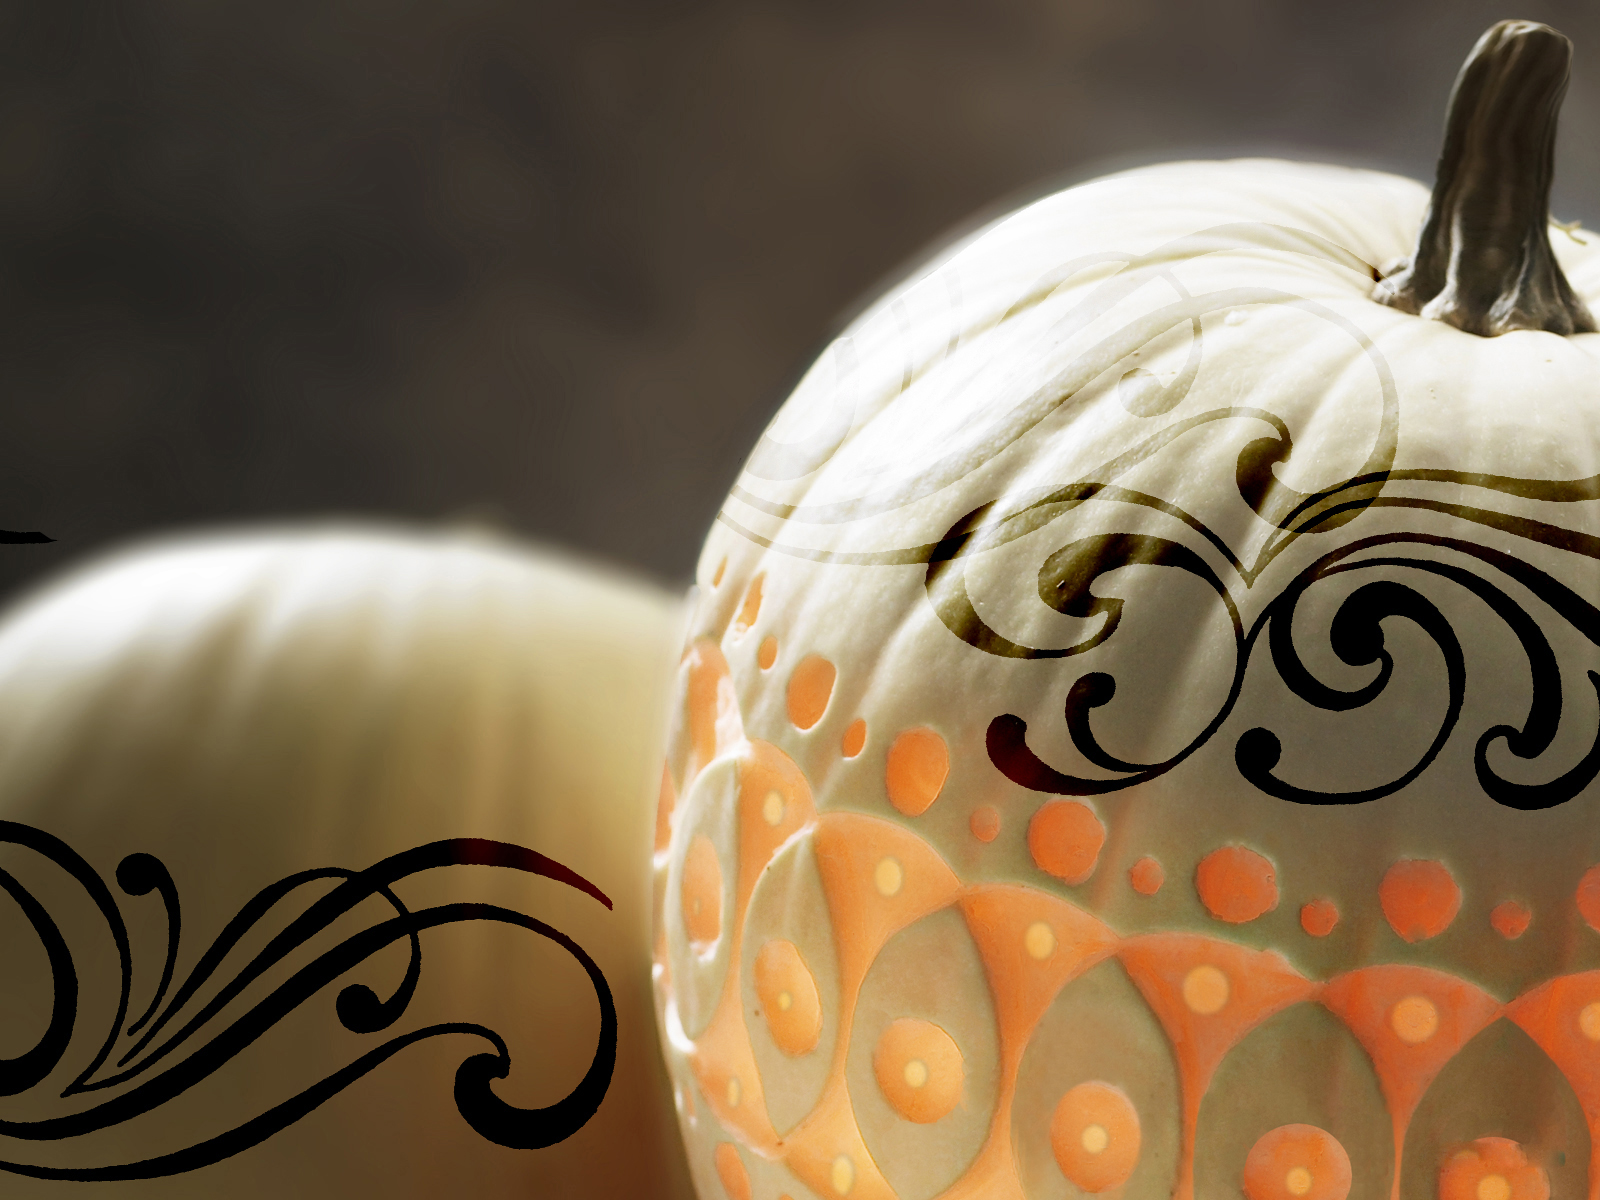 Tattoo On Pumpkin Wallpaper And Background Image 1600x1200 Id